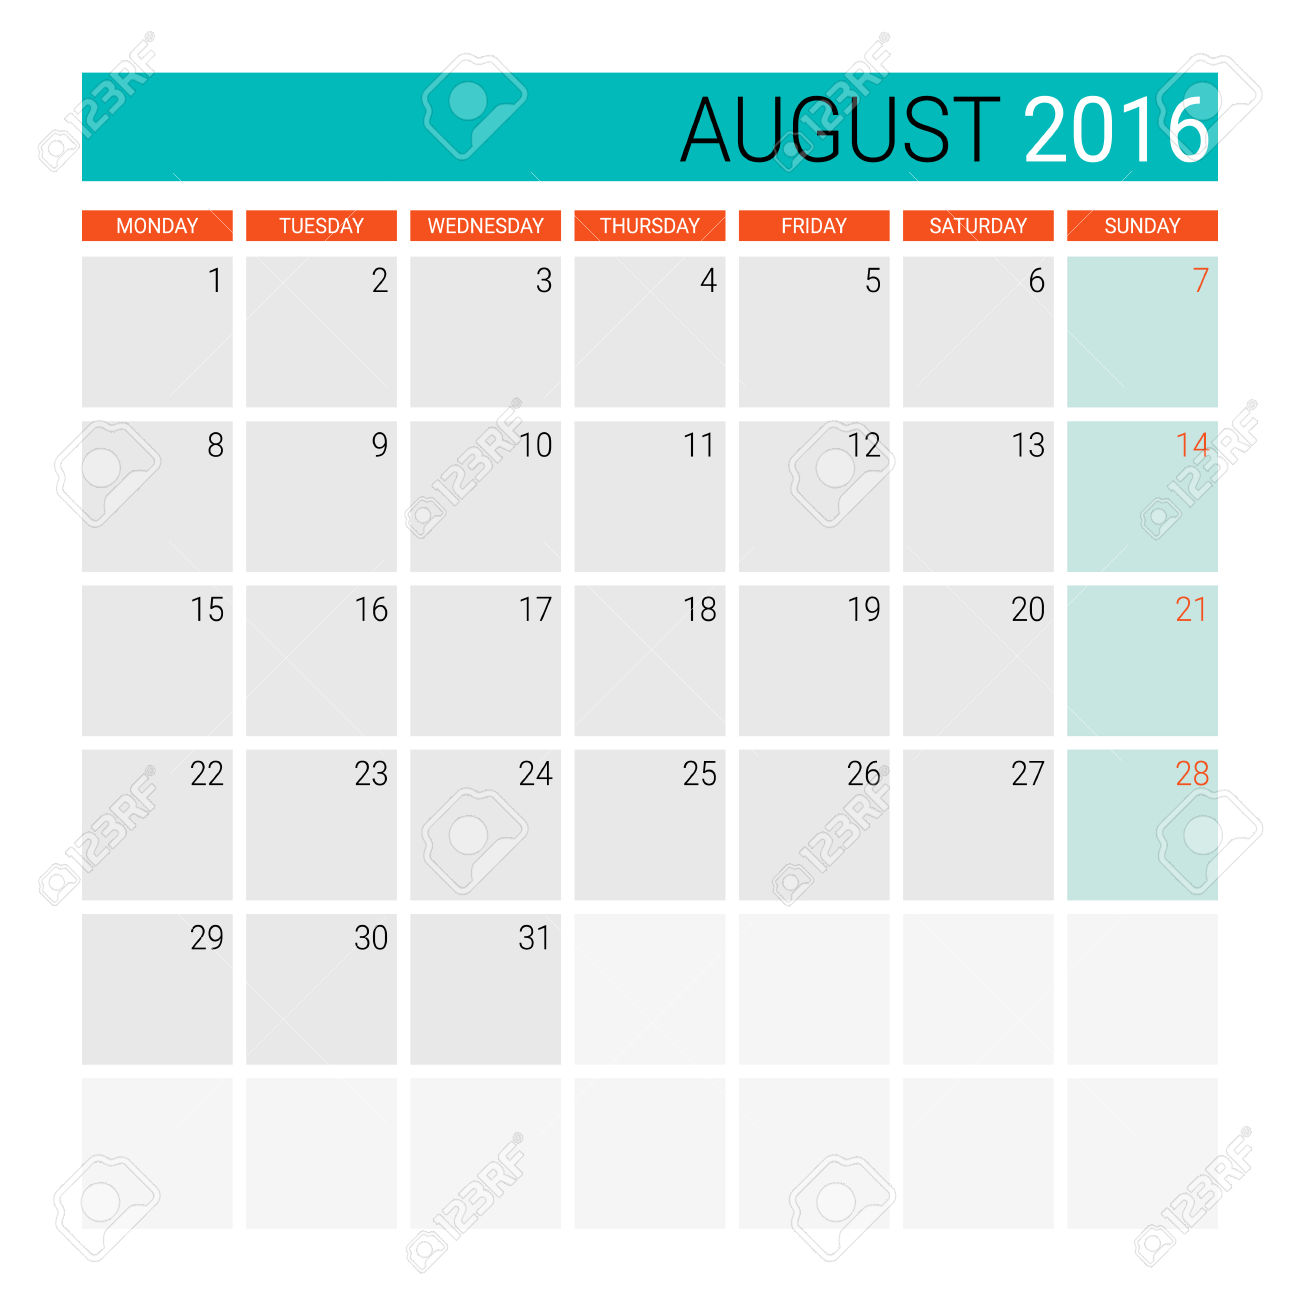 Clipart for calendar for august 2016 clipart black and white August 2016 Calendar (or Desk Planner) Royalty Free Cliparts ... clipart black and white